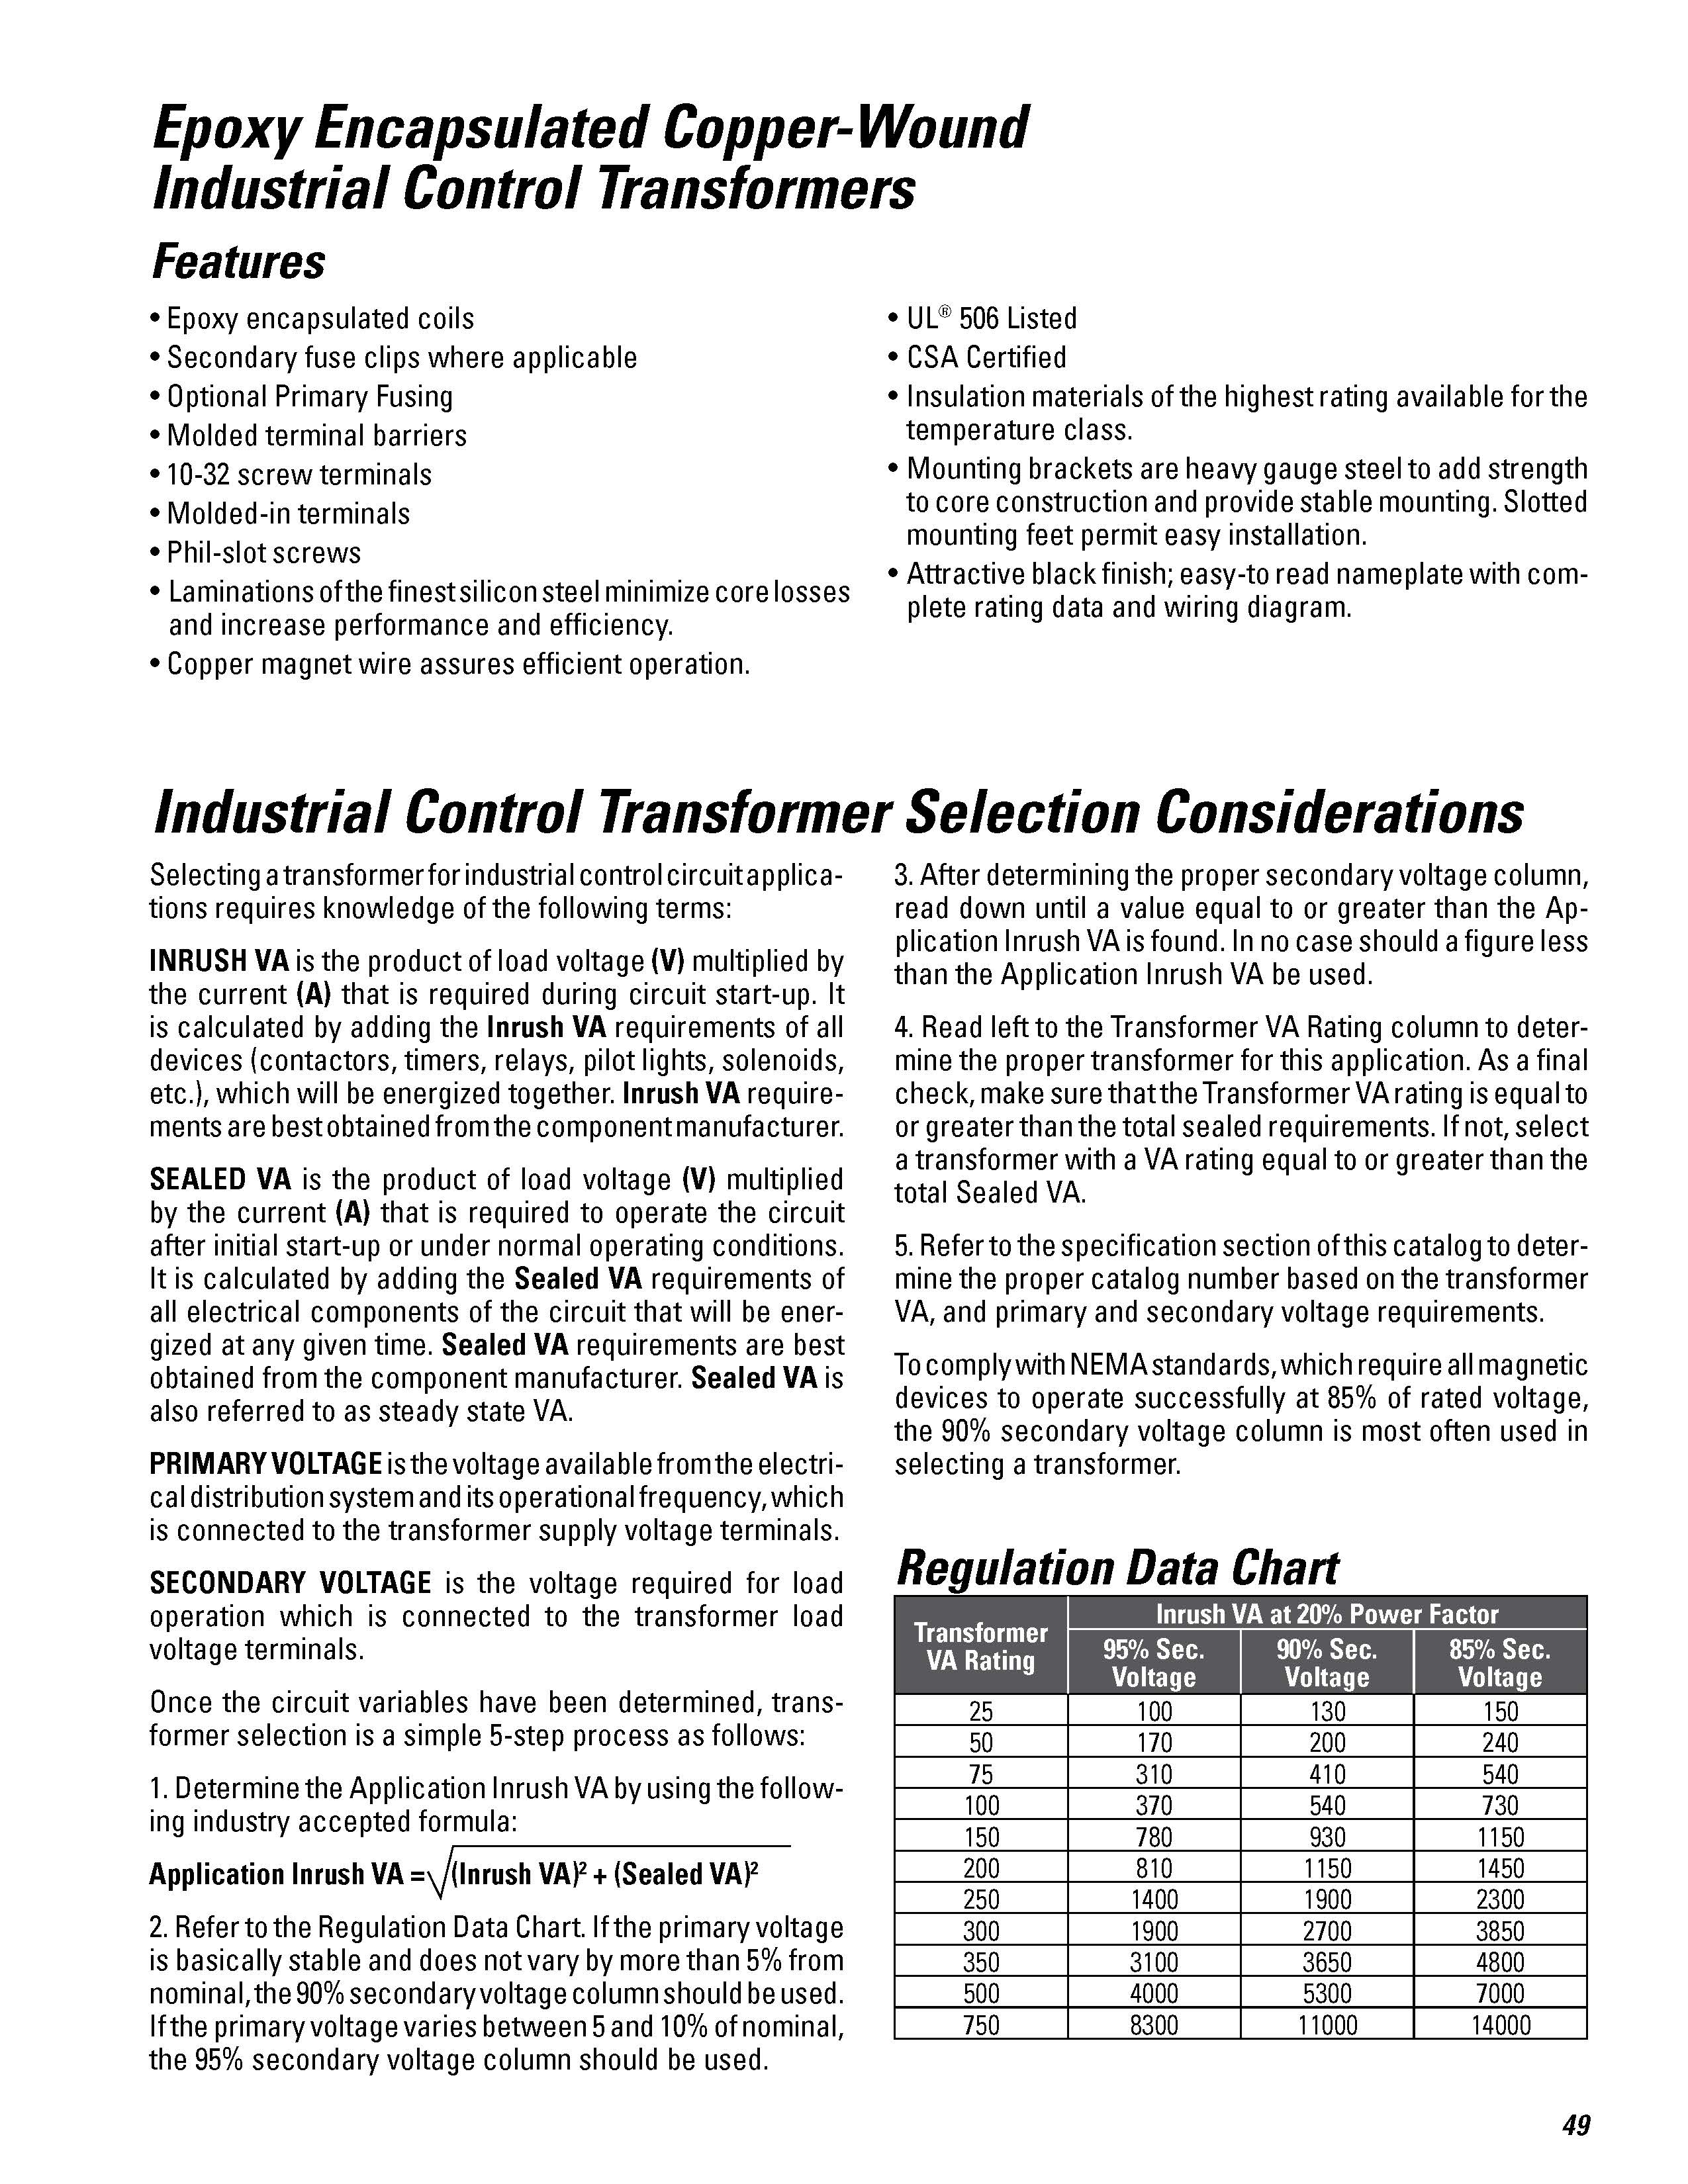 Pleasing Doe Transformer Literature Federal Pacific Wiring Digital Resources Attrlexorcompassionincorg